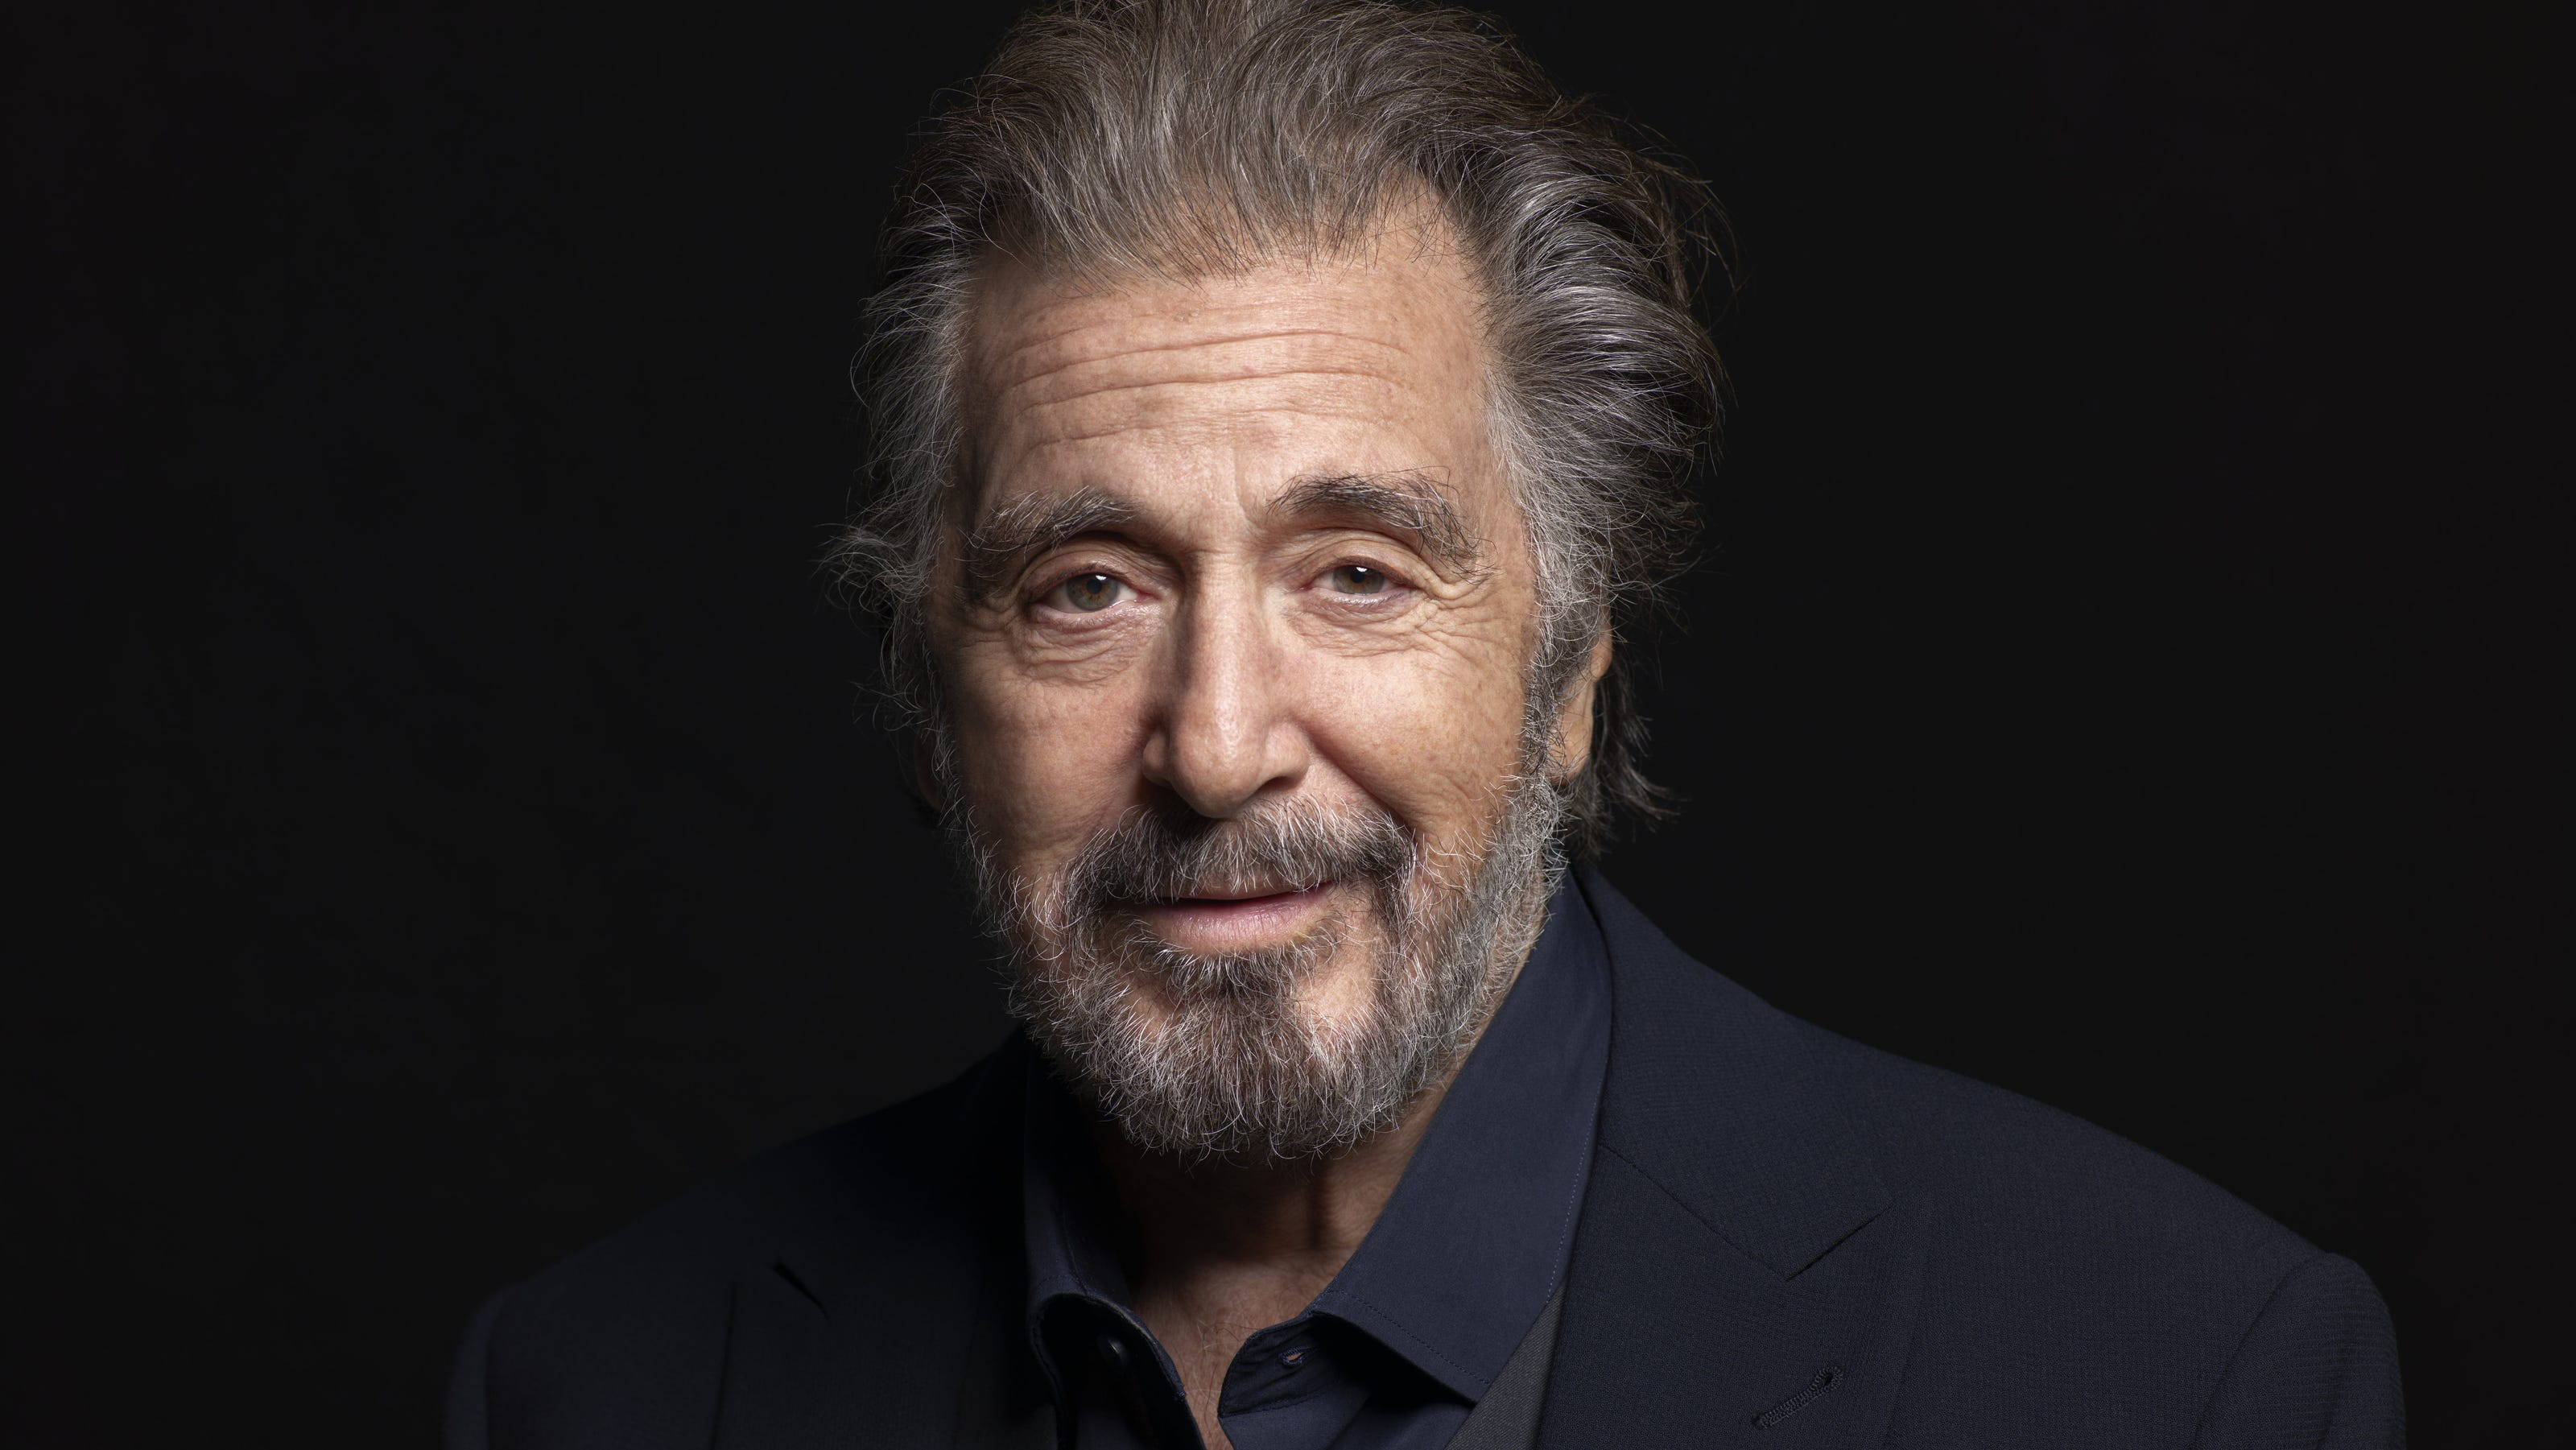 Al Pacino On Aging, 'Irishman' And Why He Doesn't Watch